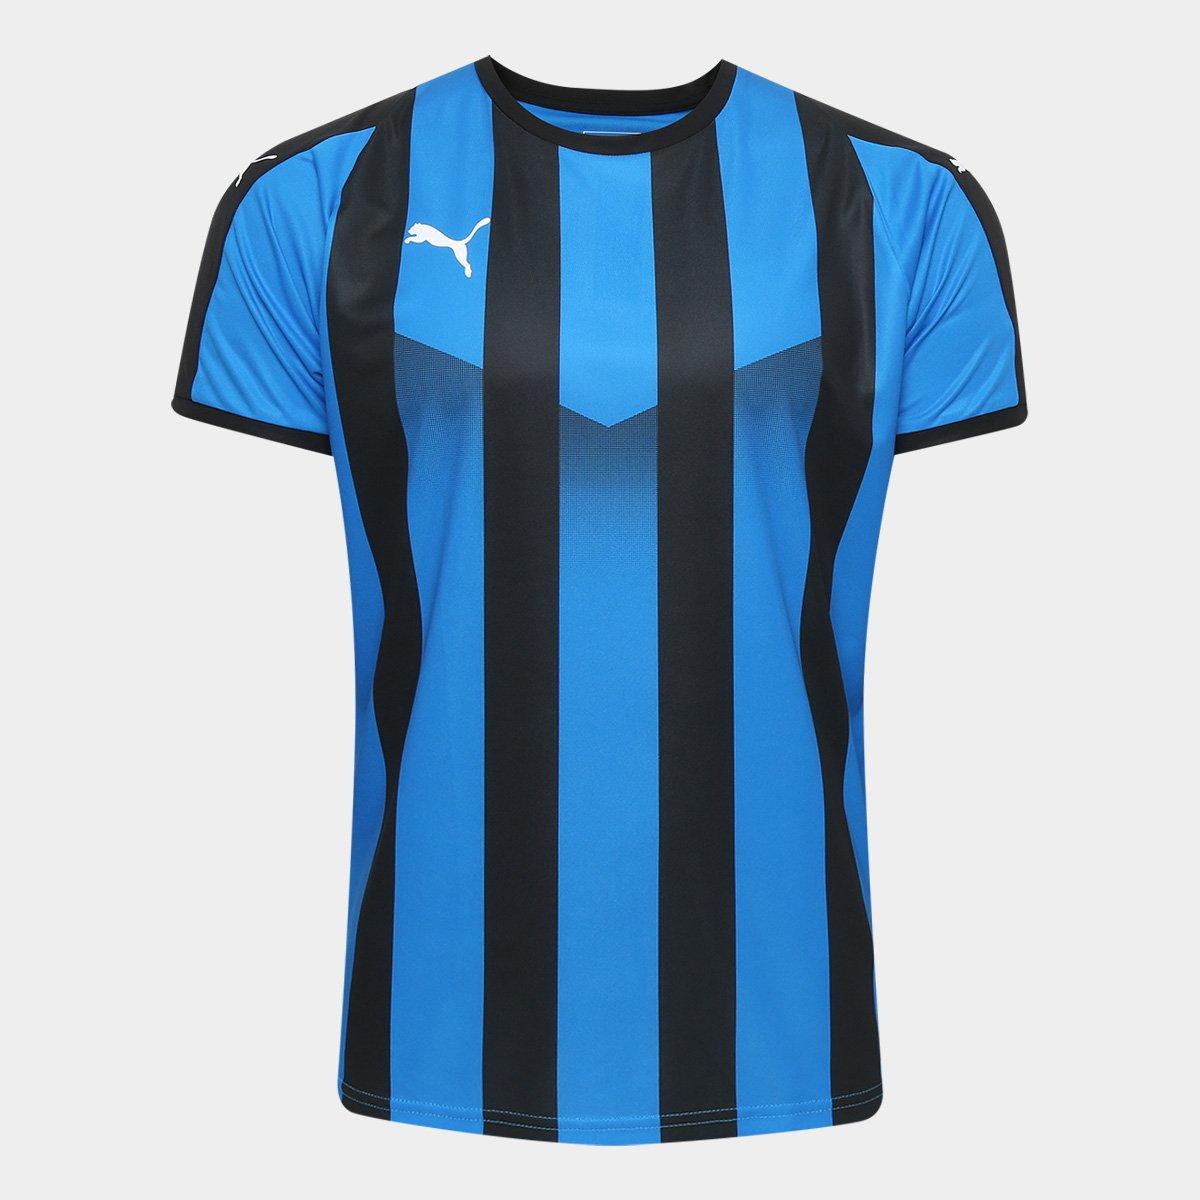 Camisa Puma Liga Jersey Striped Masculina - Compre Agora  bd049e4d5a9d2